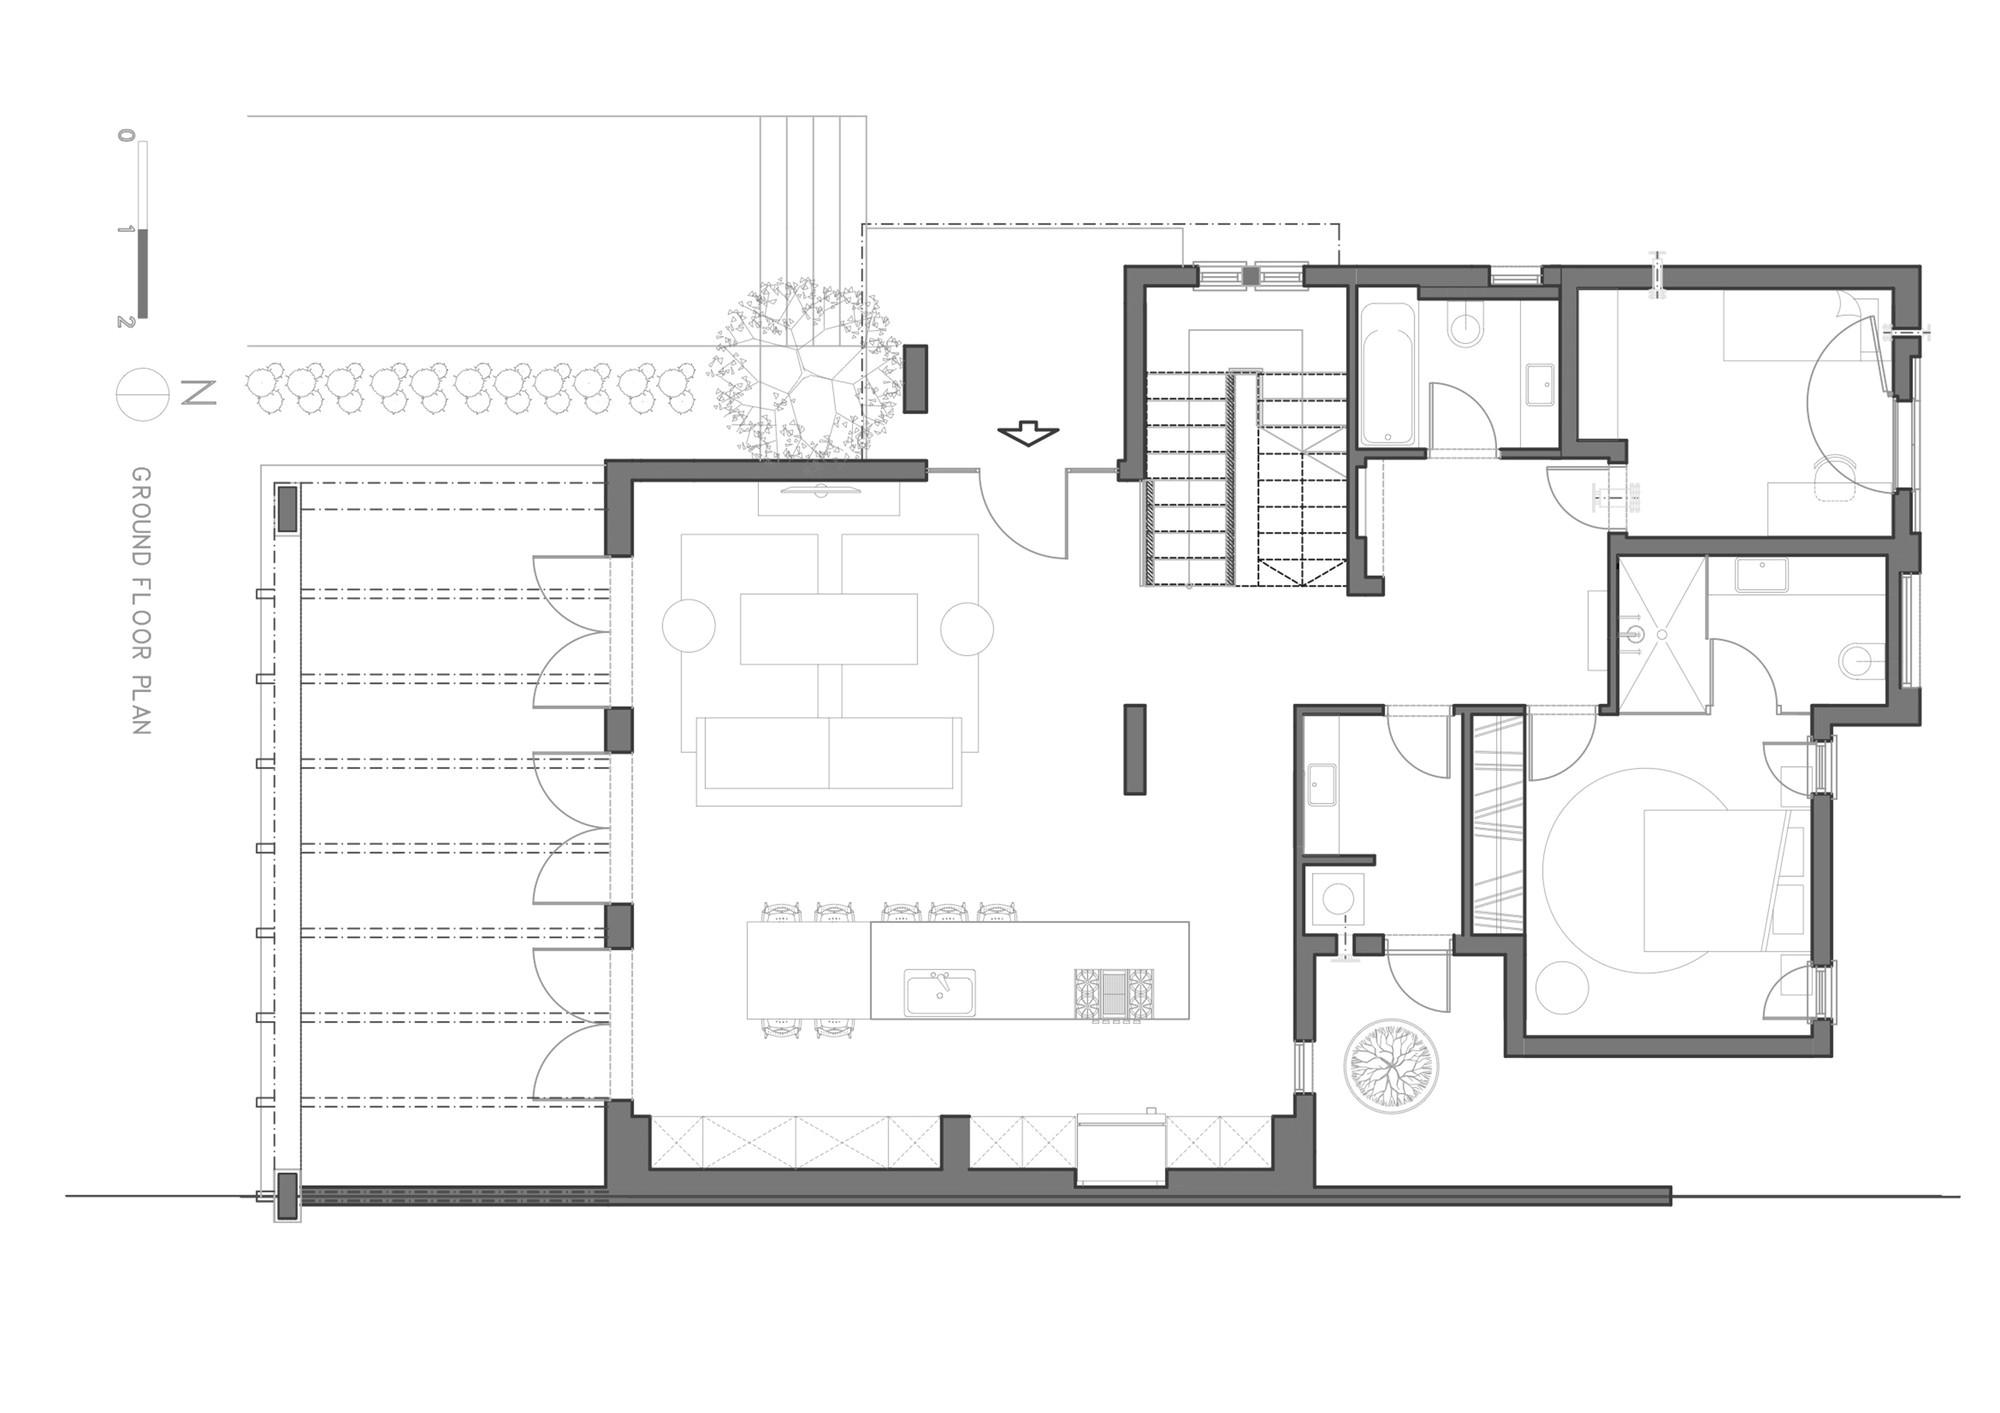 54bf25cbe58ece1abf0001dc Floor Plan